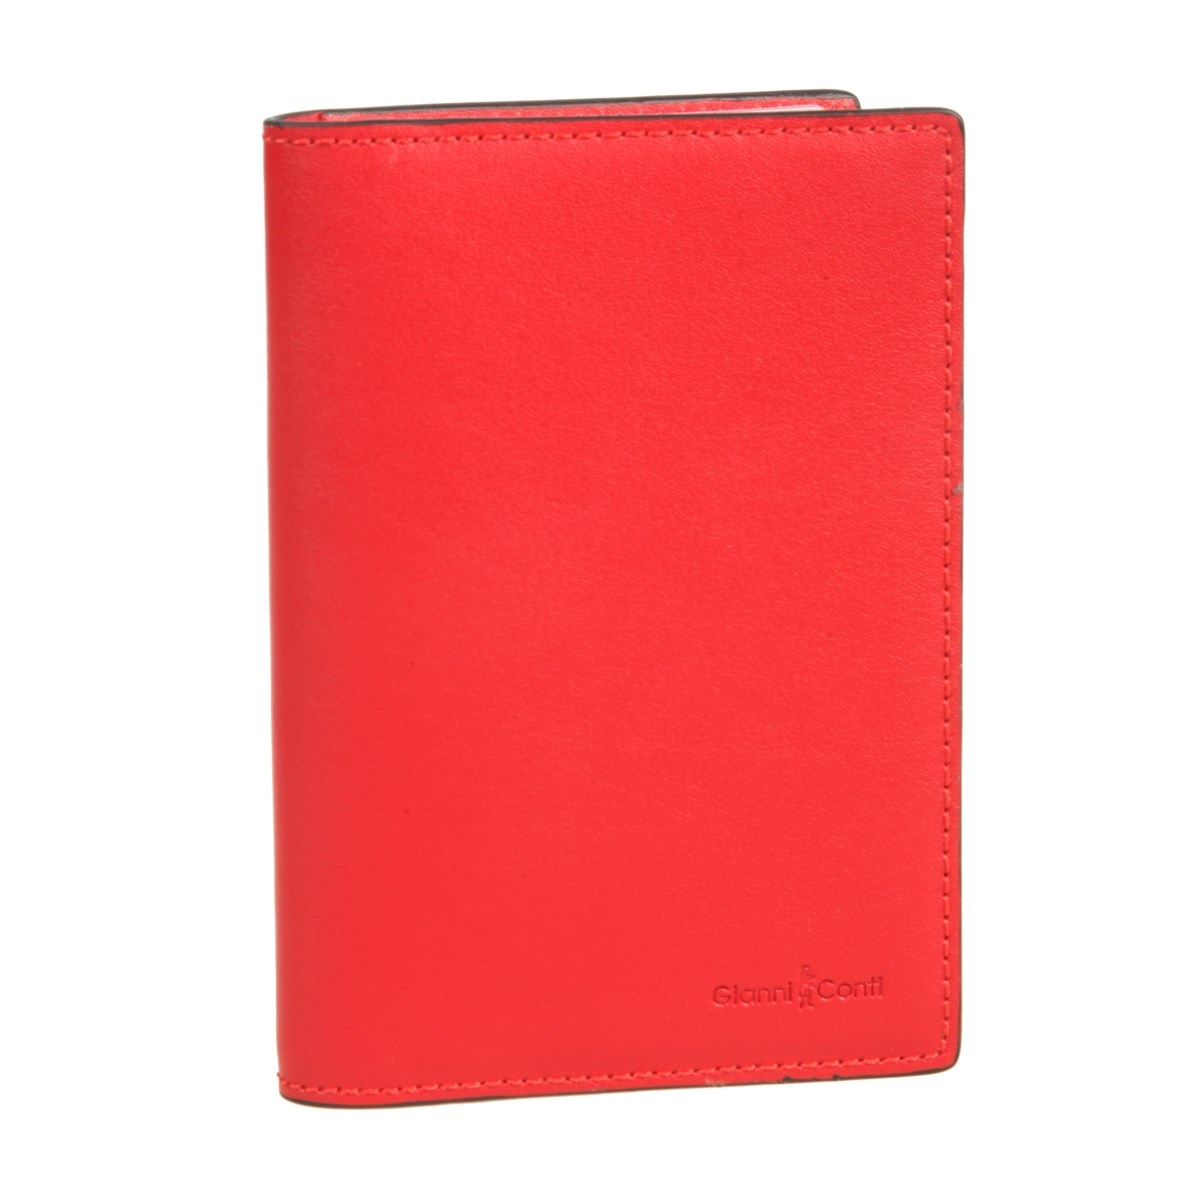 Cover for avtodokumentov Gianni Conti 1787463 red case cover for